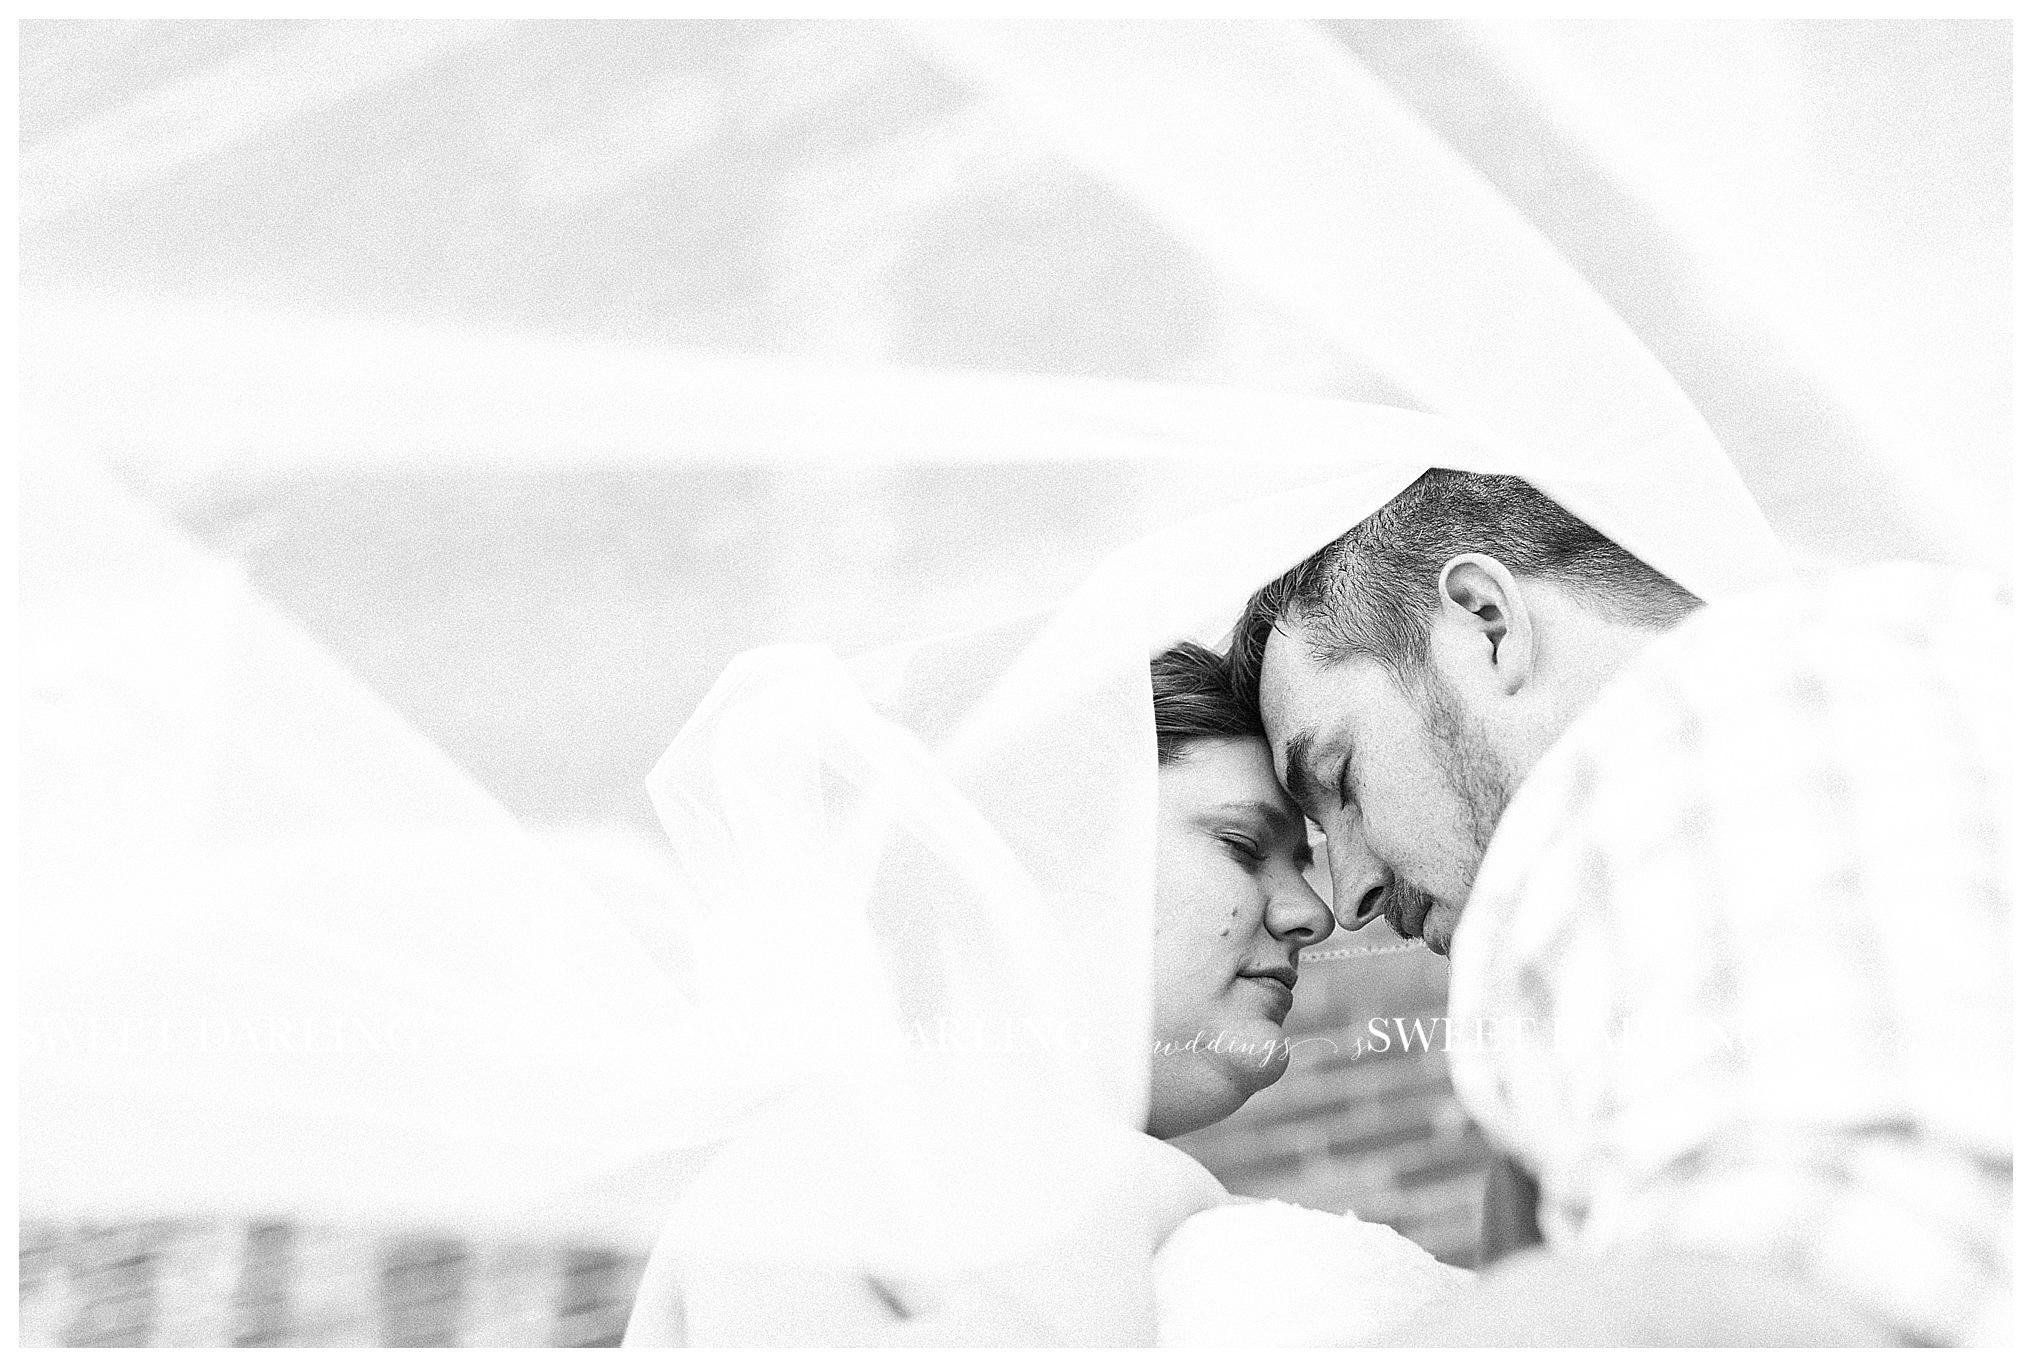 arcoloa-illinois-coles-county-wedding-photography-sweet-darling-weddings-photographer_0952.jpg